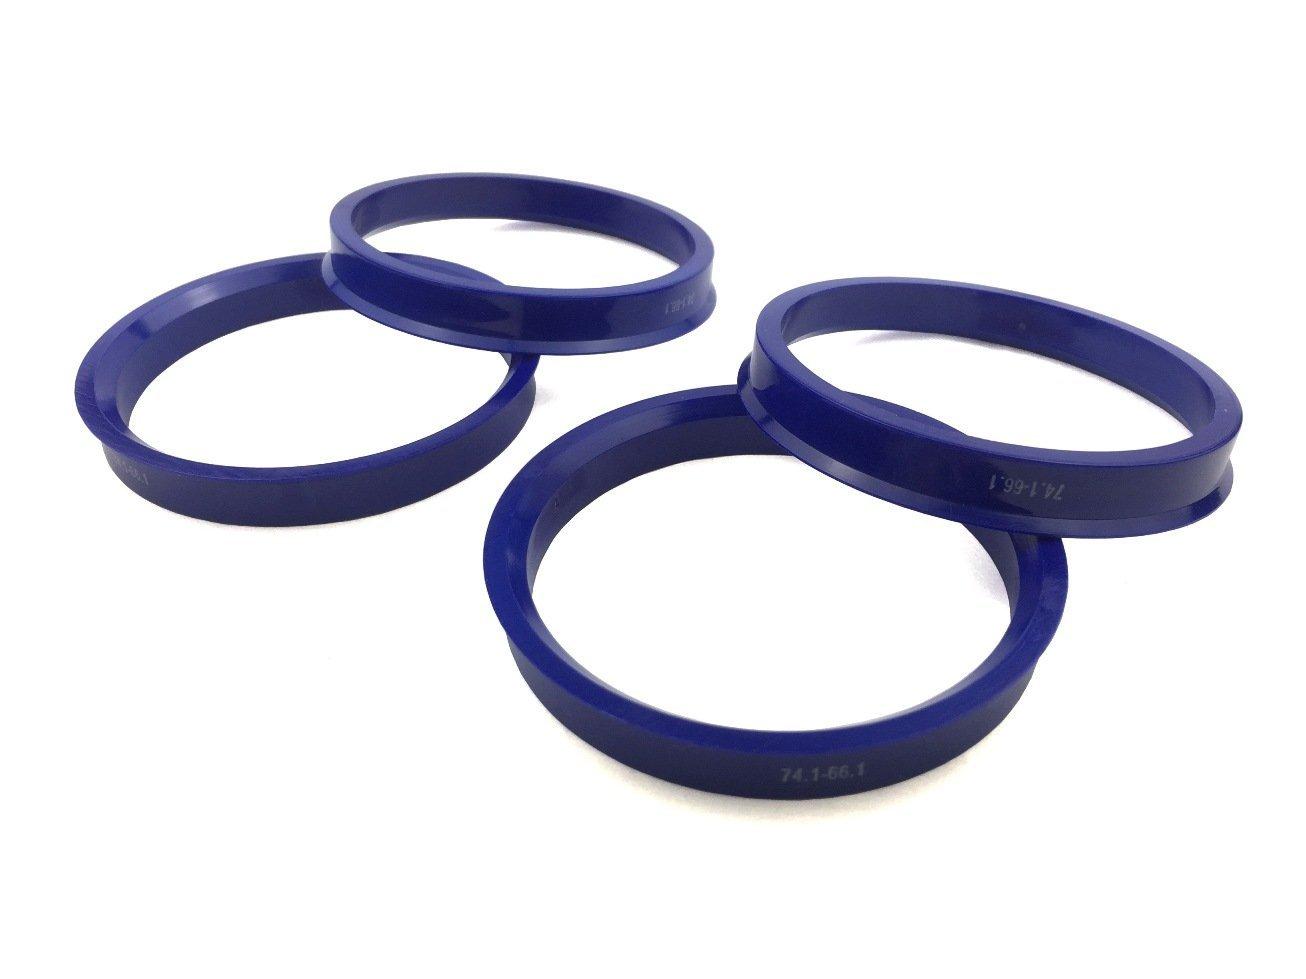 4 Pieces - Hub Centric Rings - 74.1mm OD to 66.1mm ID - Dark Blue Poly Carbon Hub Rings JianDa